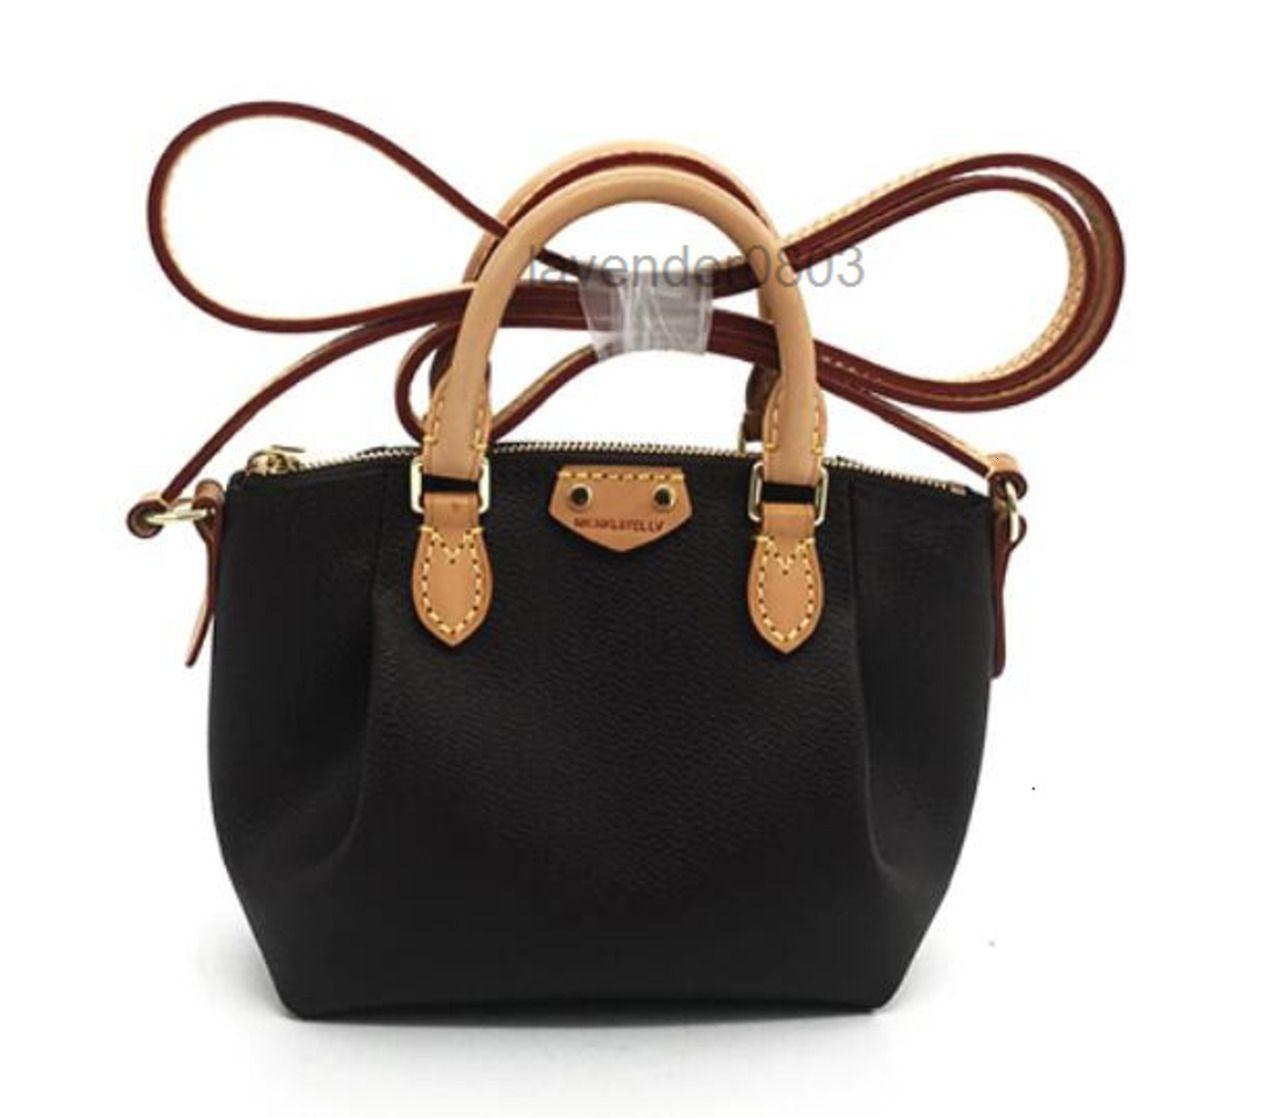 Grade Brown Top Genuine Leather Lady Handbag Nano mini M61253 Women Fashion Shoulder Bag Messenger Oxidization